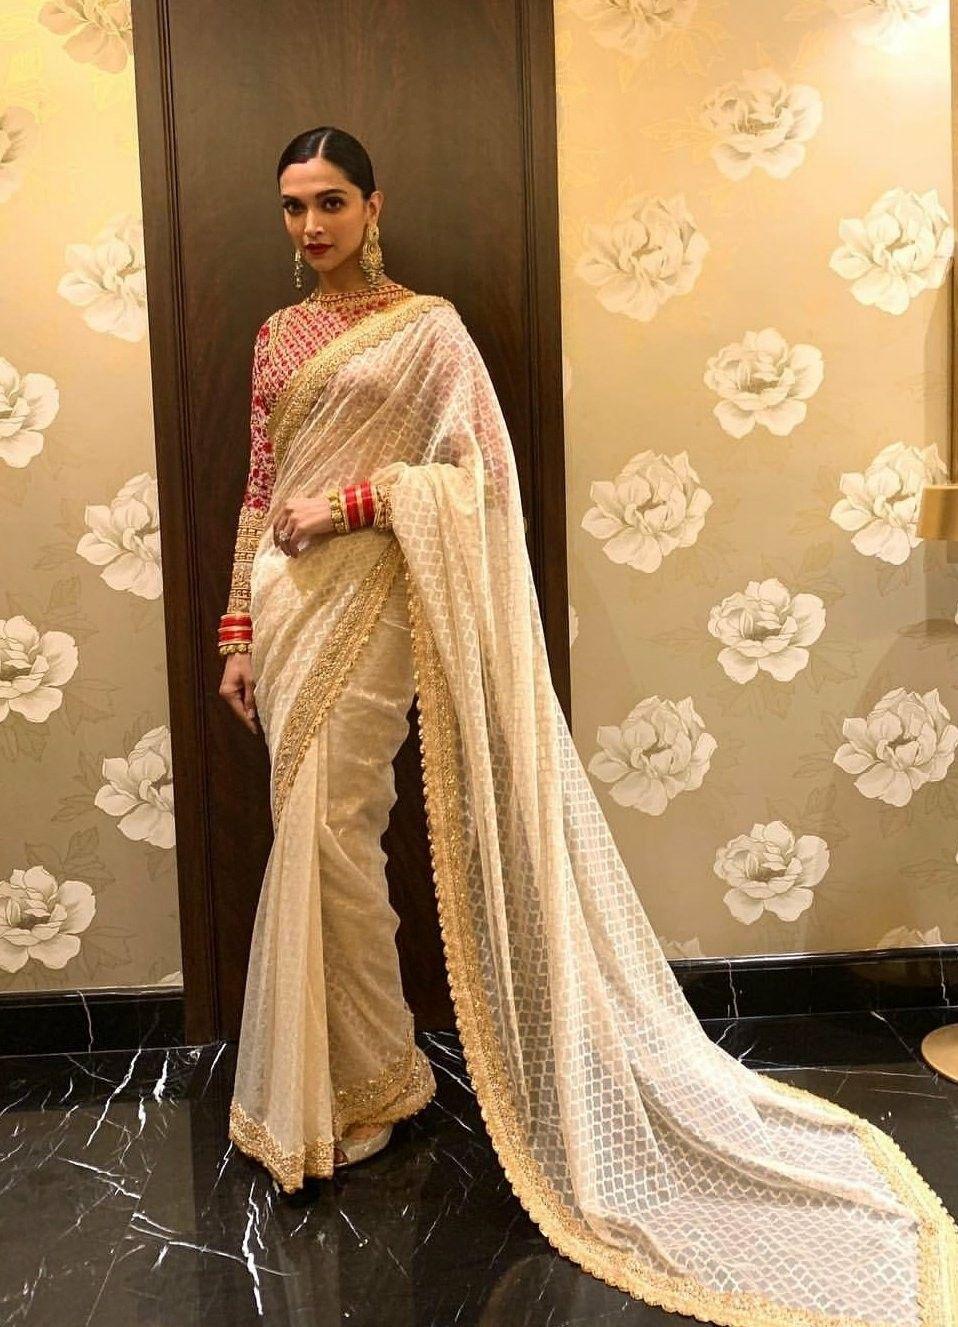 Deepika Padukone | Indian wedding outfits, Deepika ...